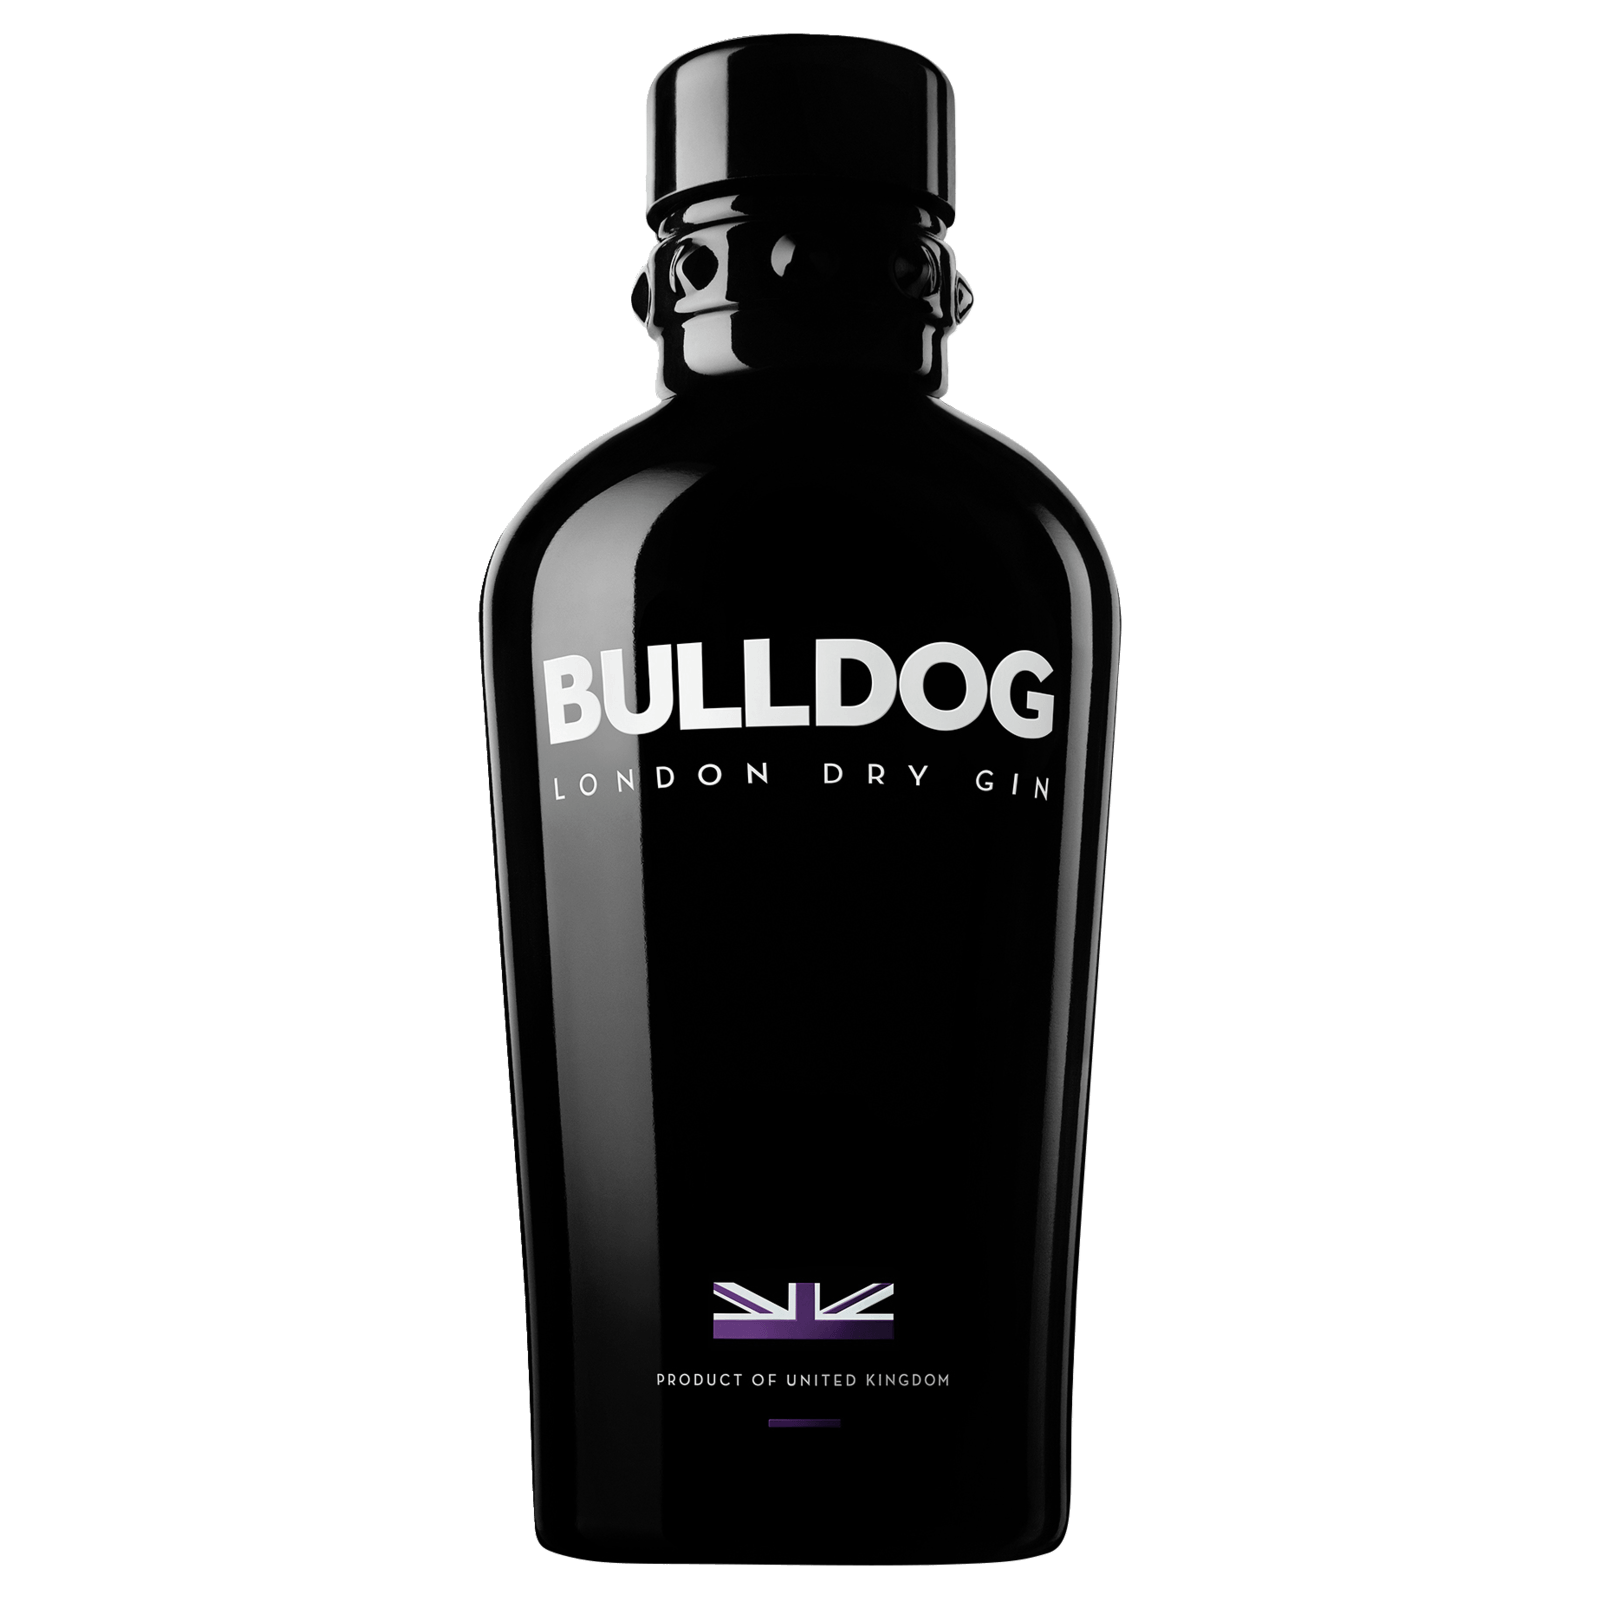 Bulldog London Dry Gin 0,7l bei REWE online bestellen!